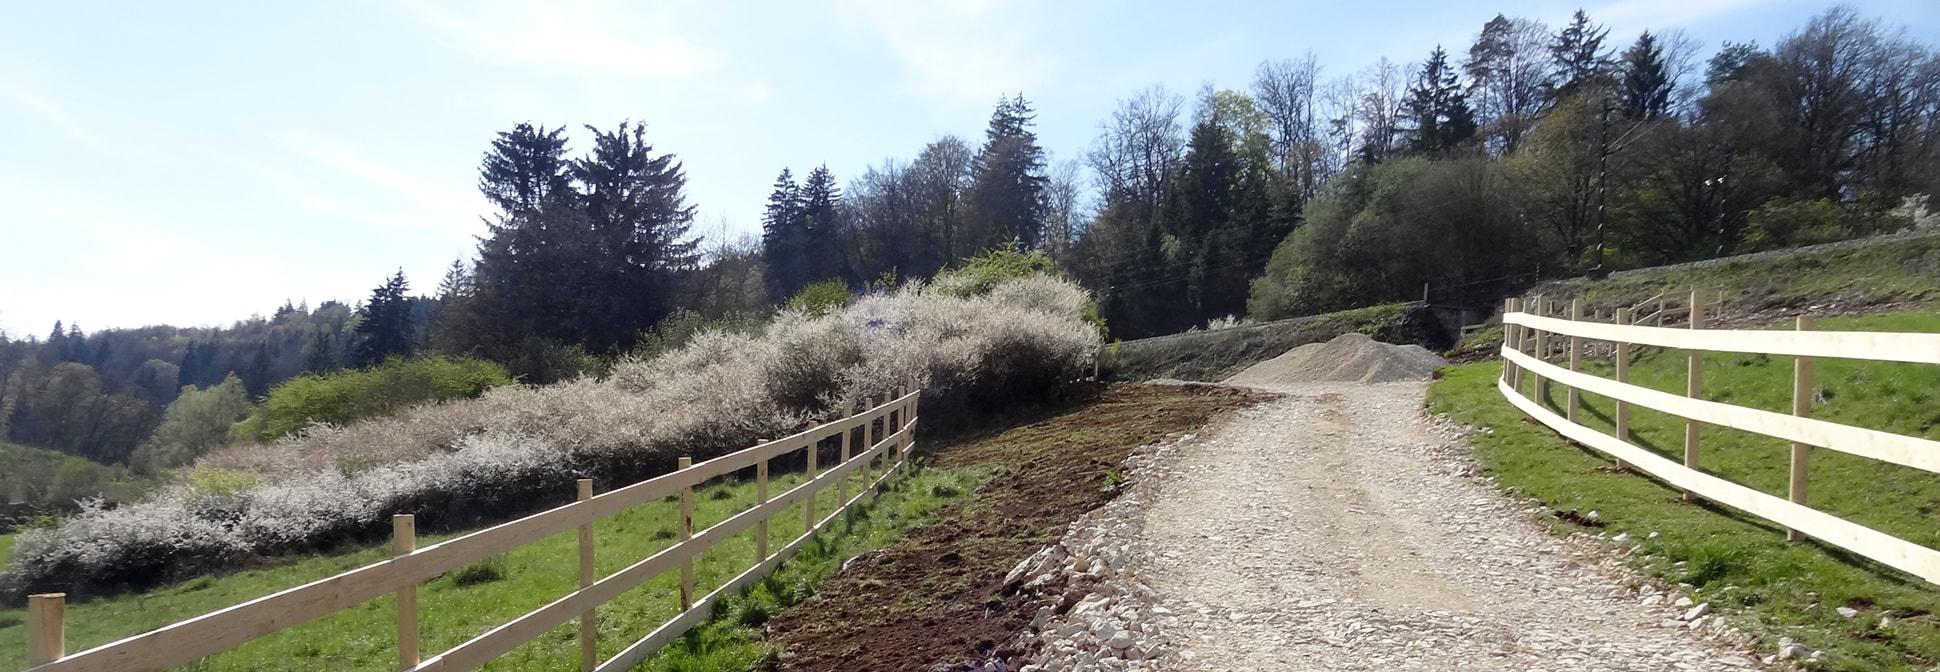 Umweltbaubegleitung in Treuchtlingen Zugang